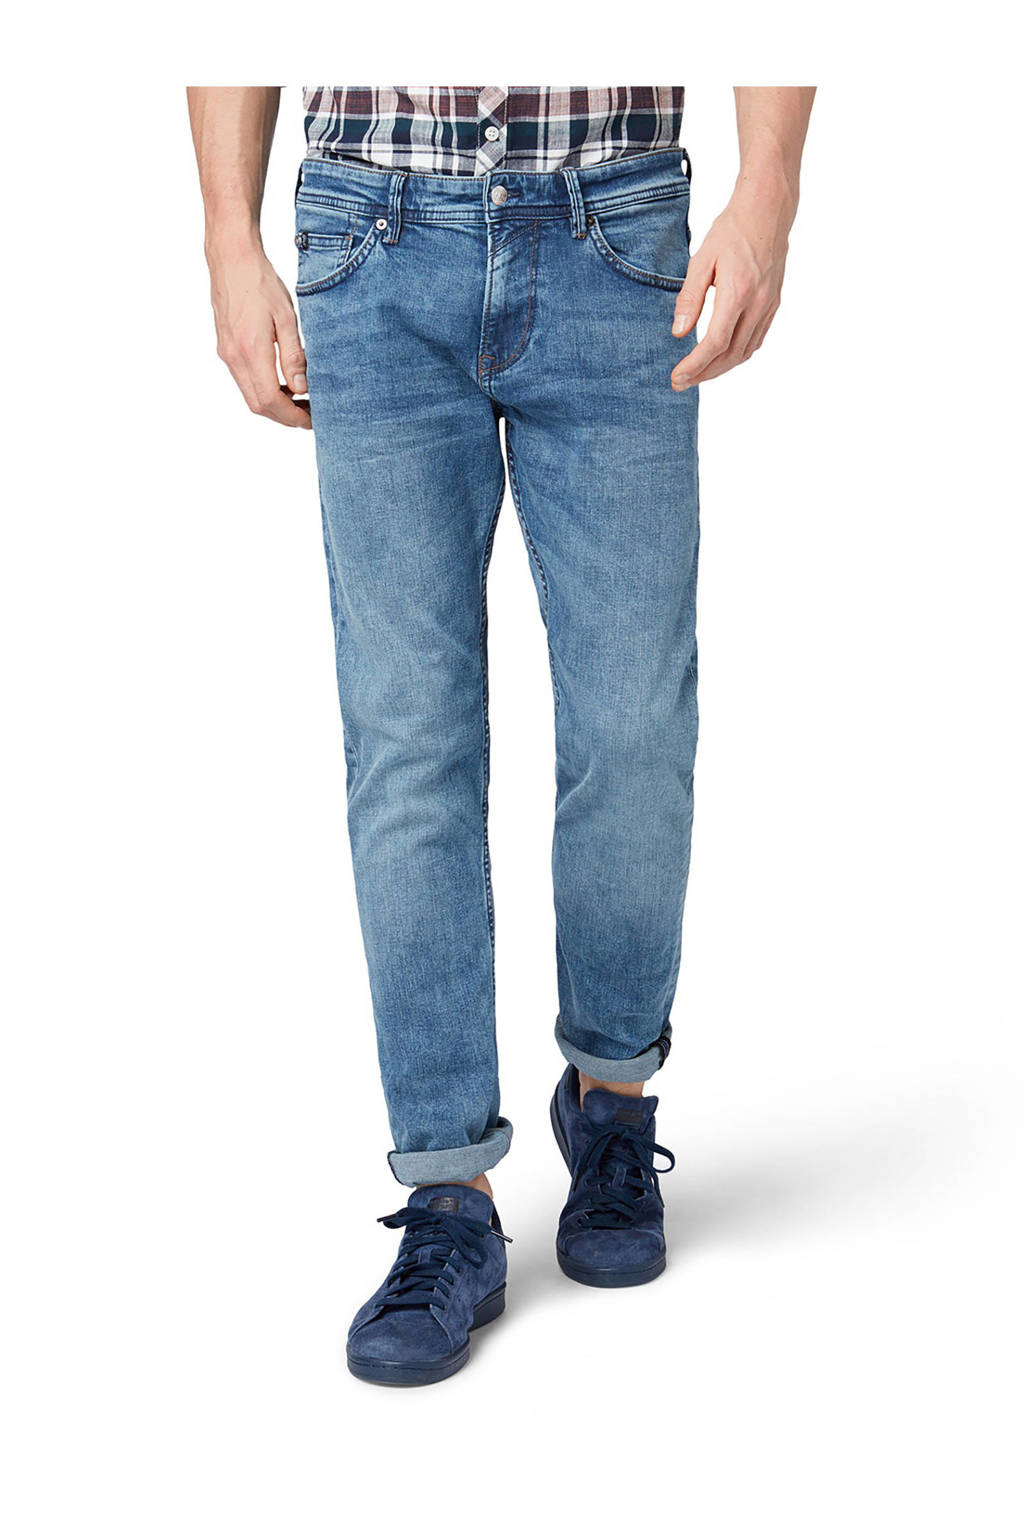 Tom Tailor slim fit jeans Piers light stone wash denim, 10280 light stone wash denim